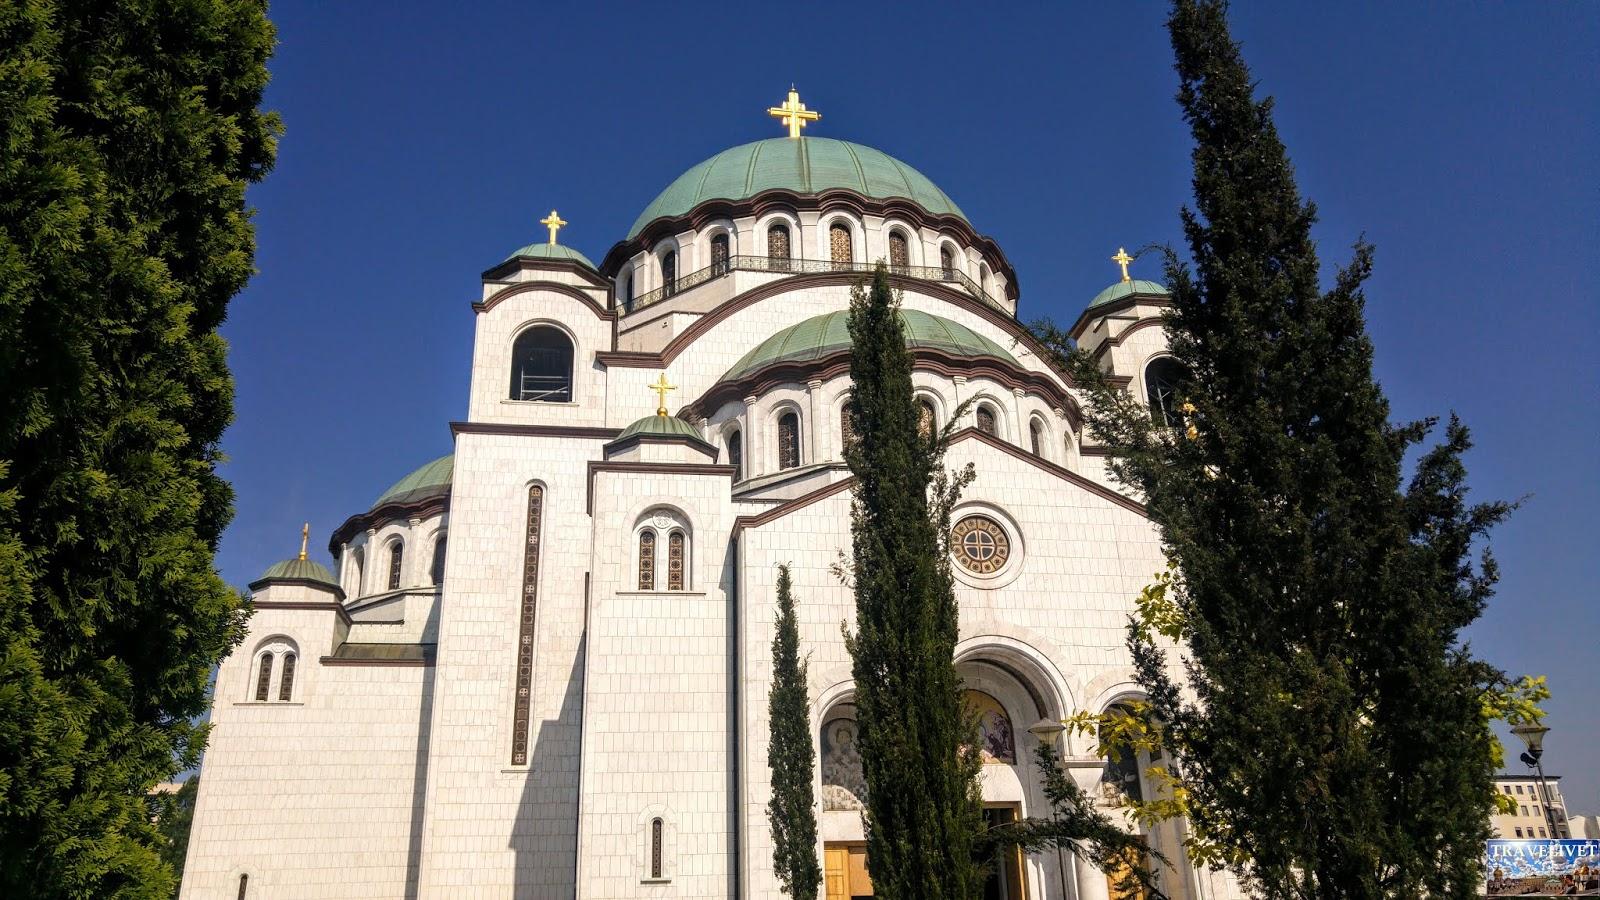 Serbie Belgrade l'église Saint-Sava de Belgrade